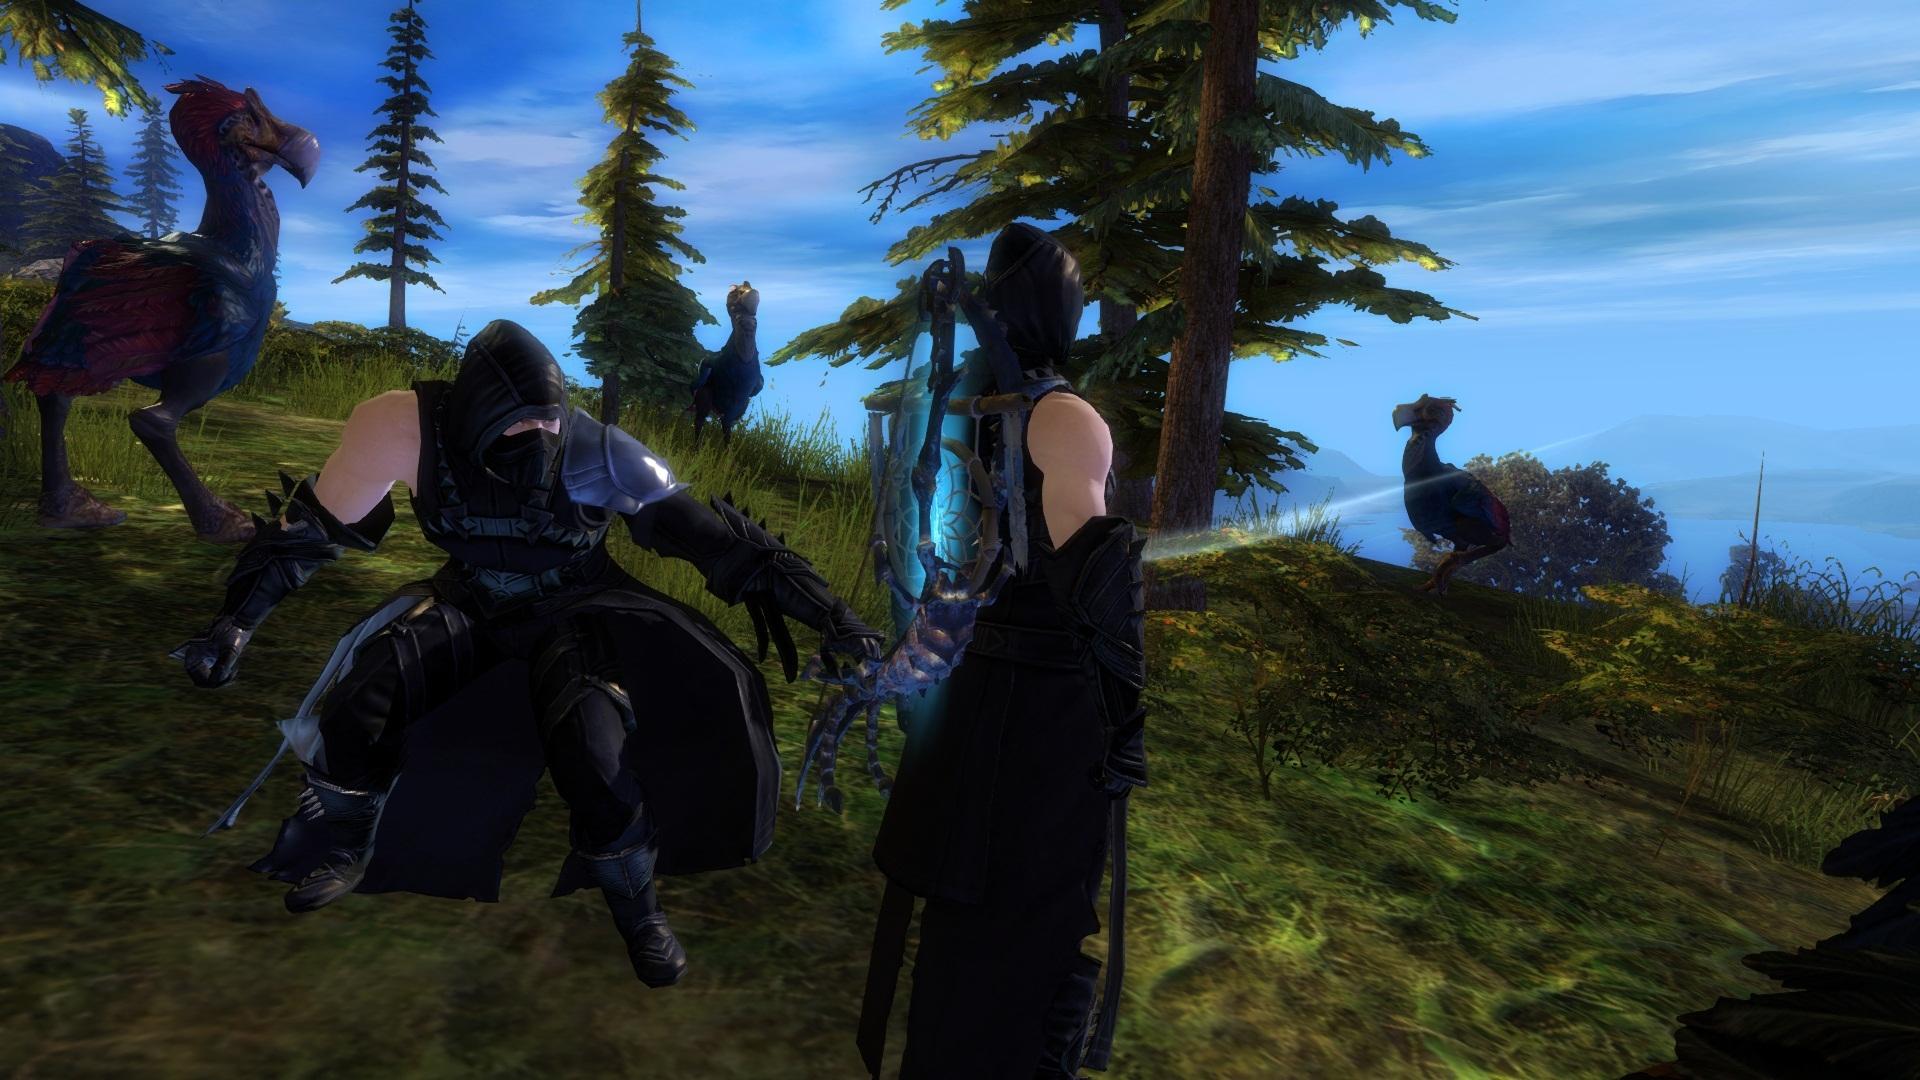 Andersines Album guild wars 2 forum - thief